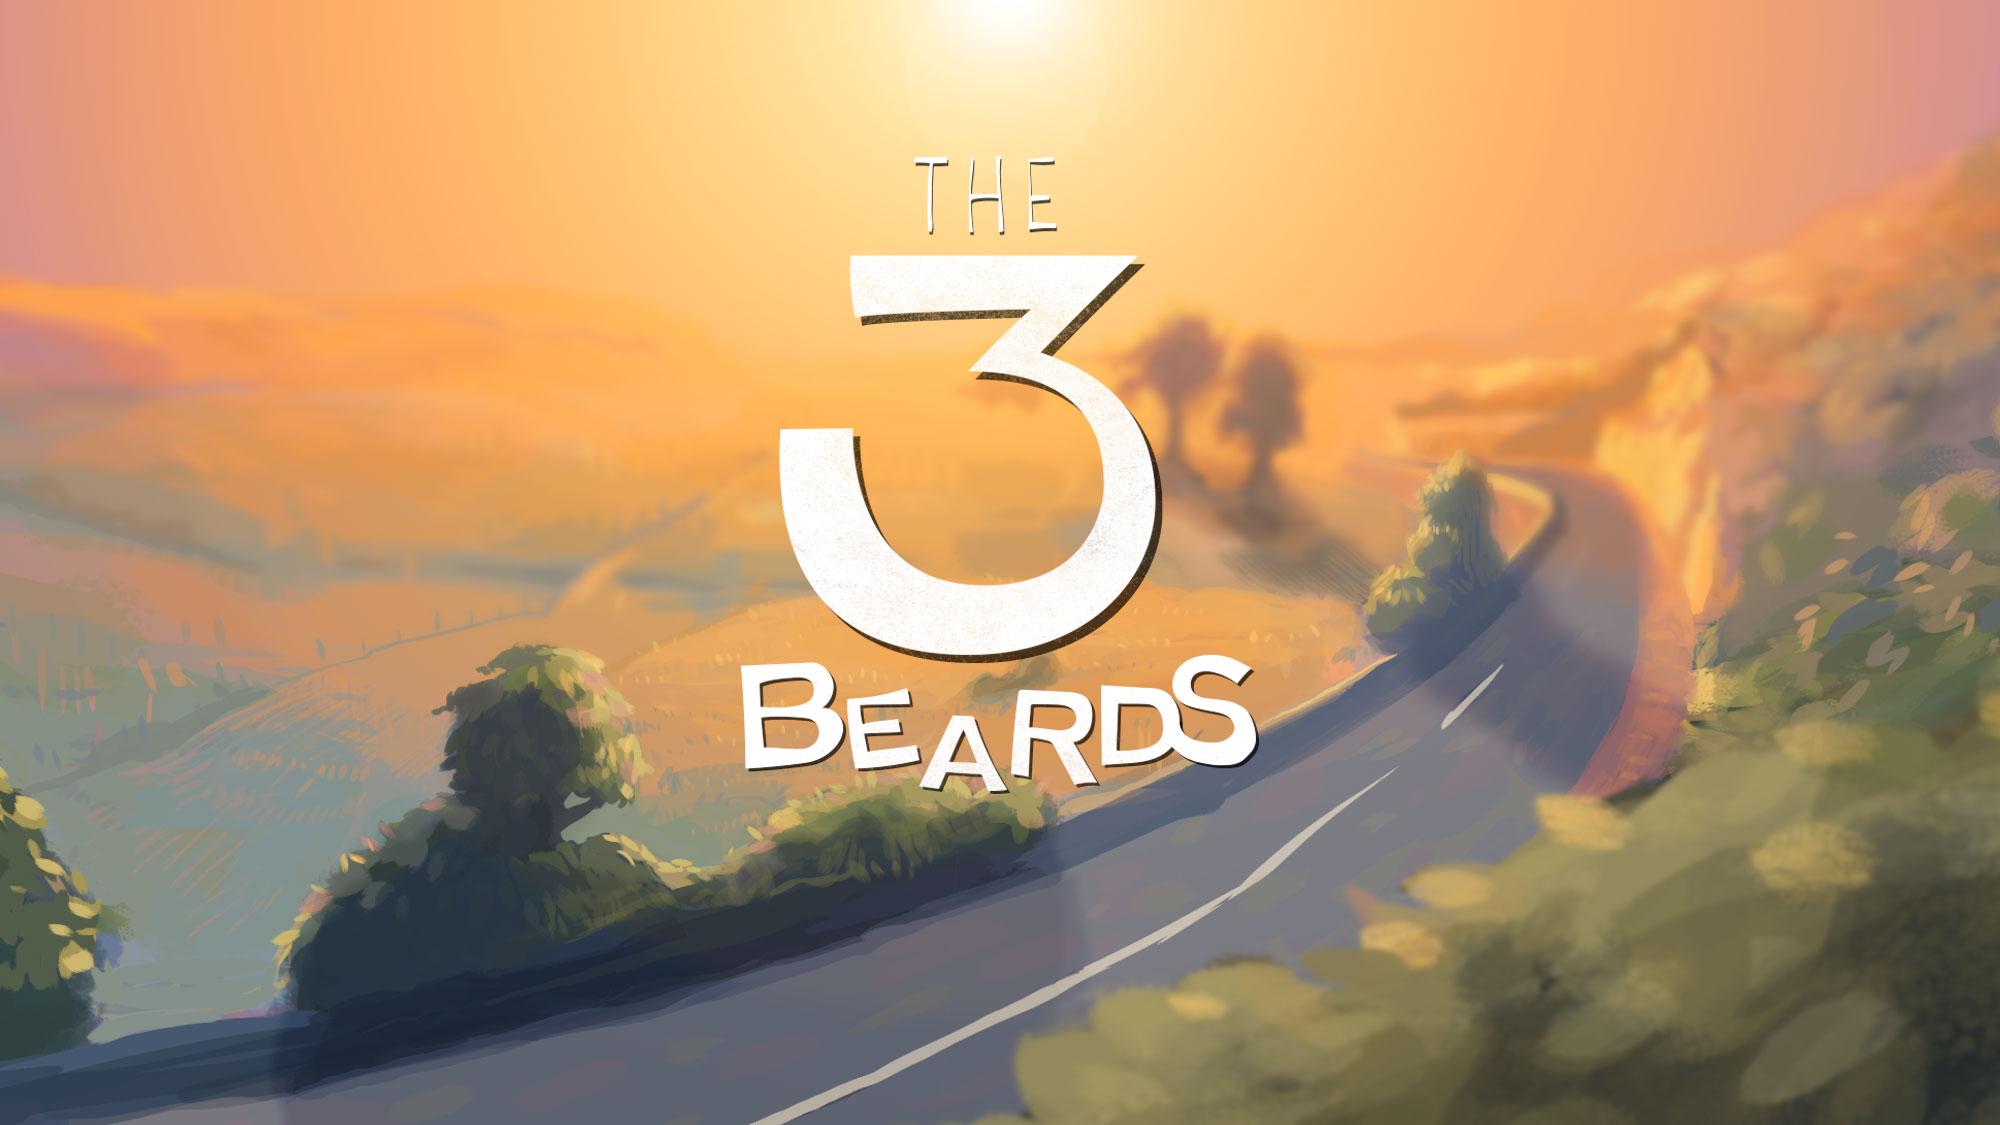 The 3 Beards